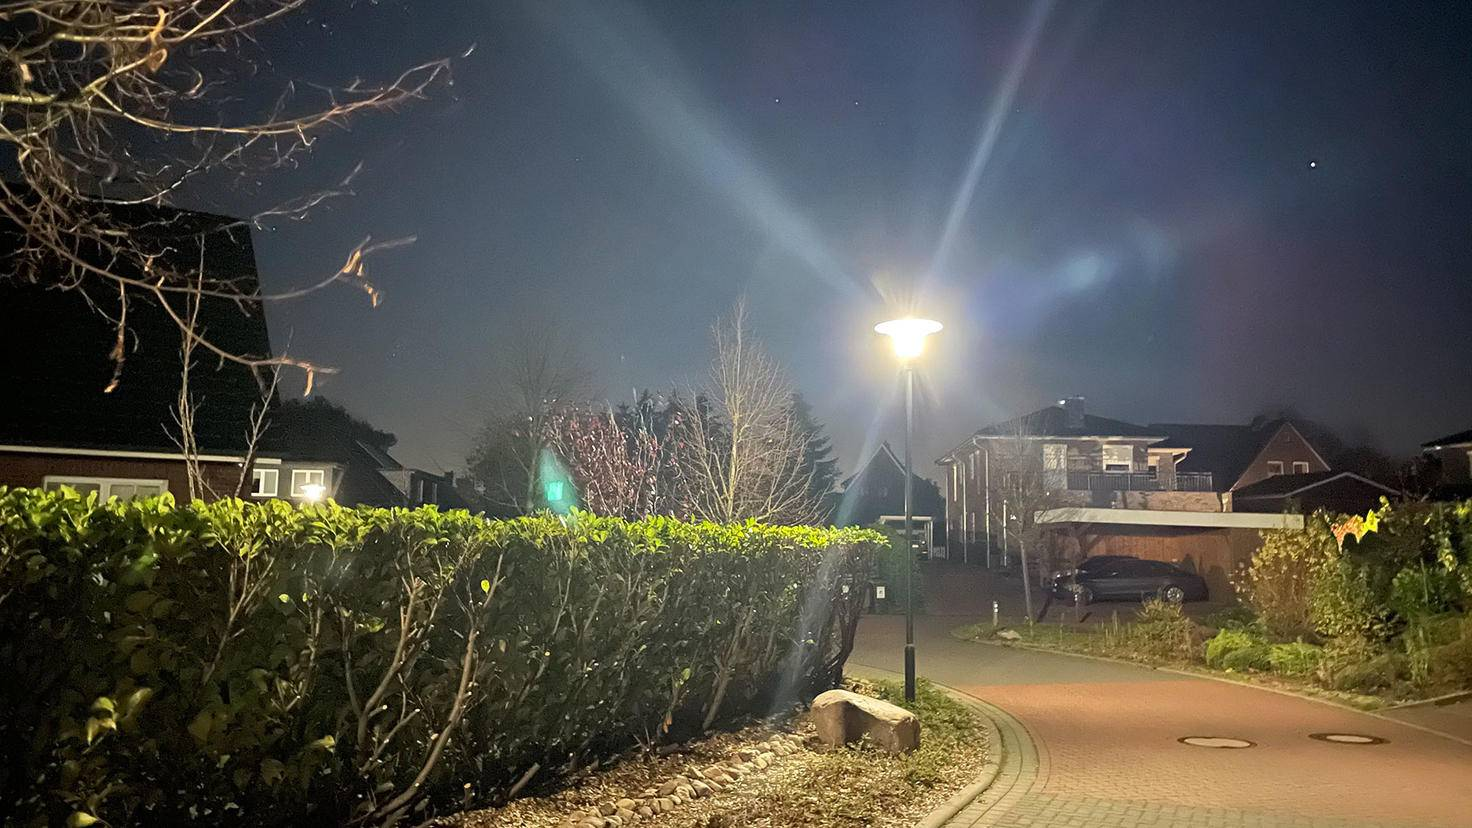 Kameraaufnahme bei Dunkelheit